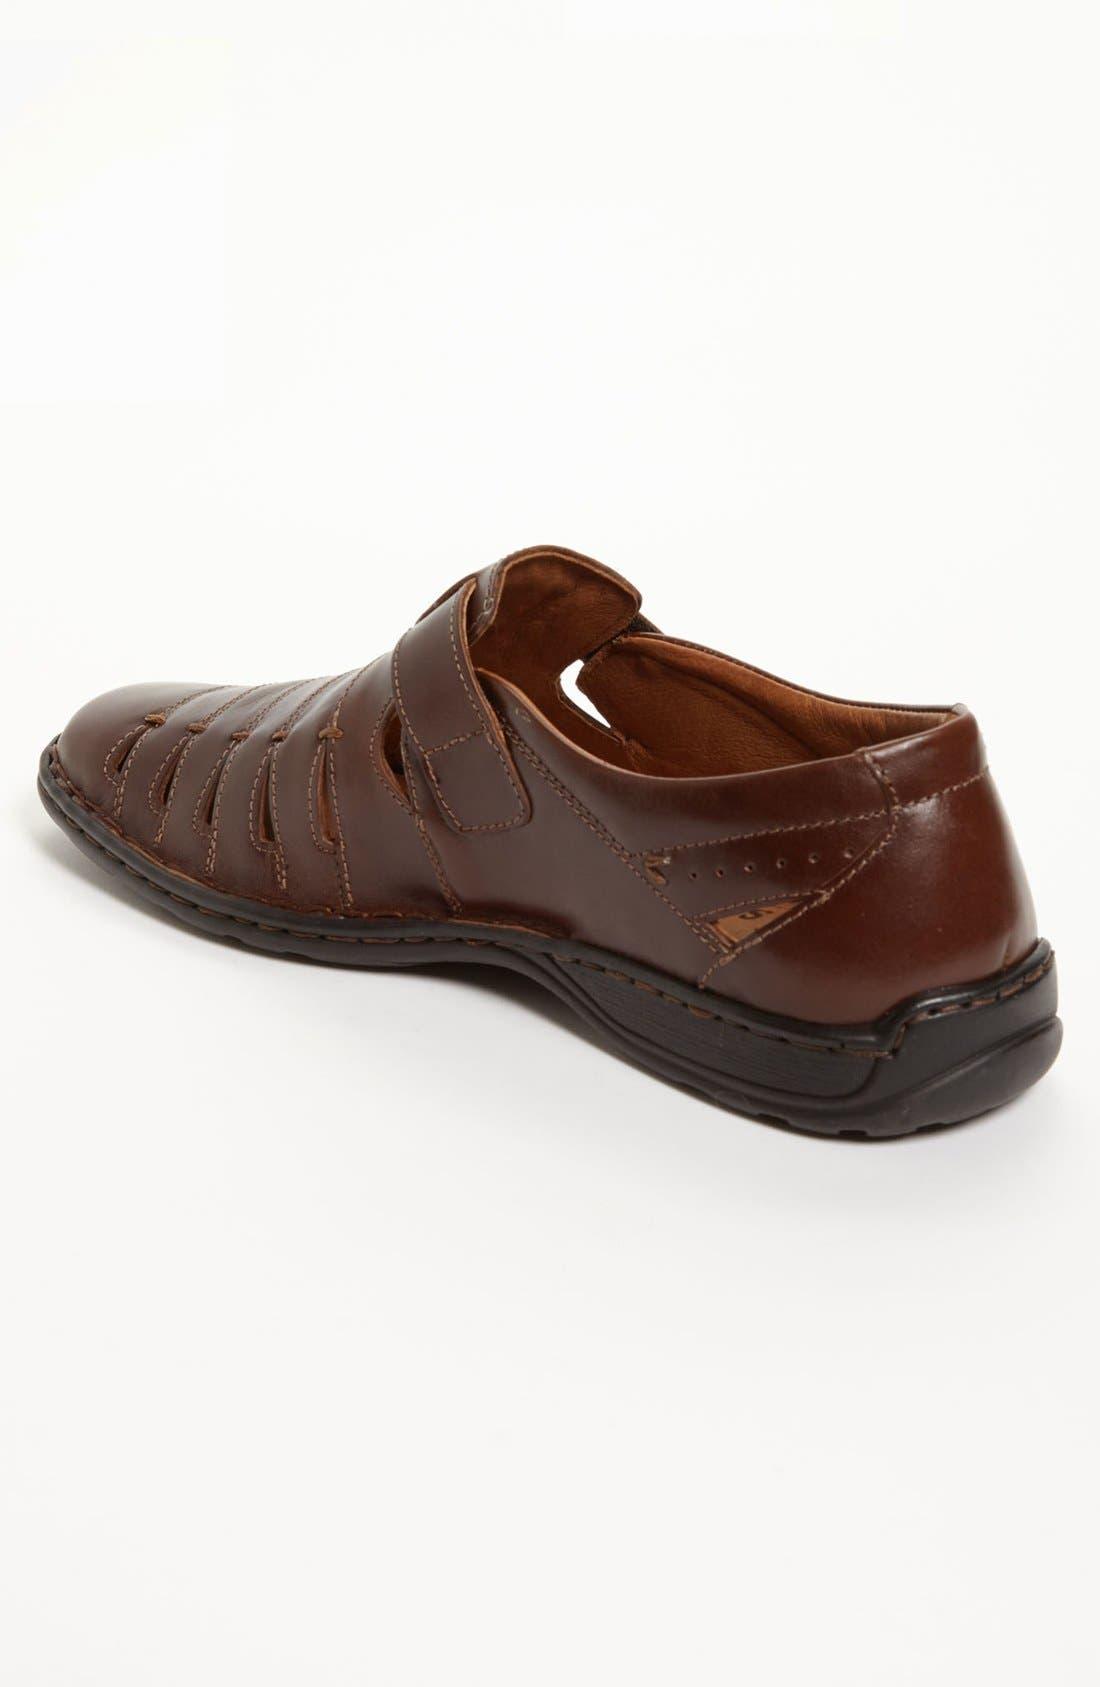 'Lionel 06' Sandal,                             Alternate thumbnail 2, color,                             Brown/ Brown Leather